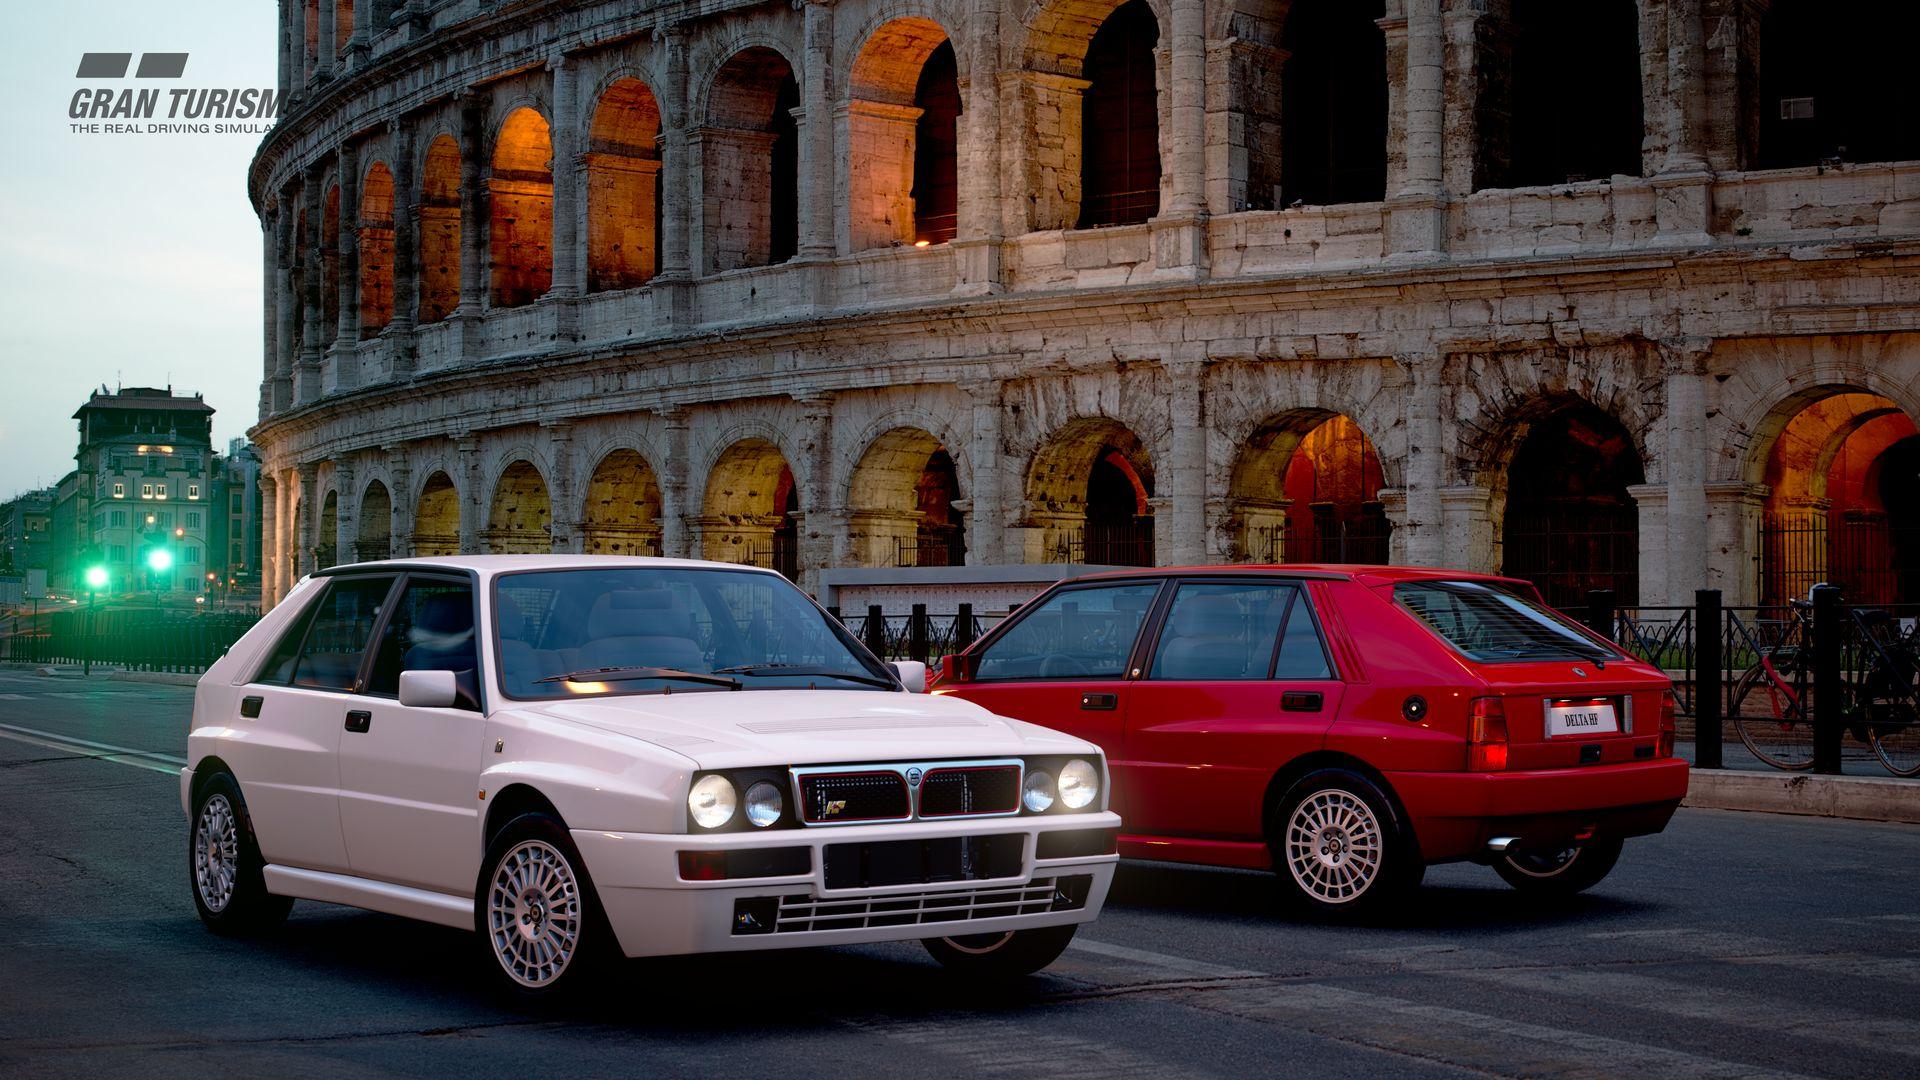 Gran Turismo Sport August Update Lancia DELTA HF Integrale Evoluzione '91 (N200) 1